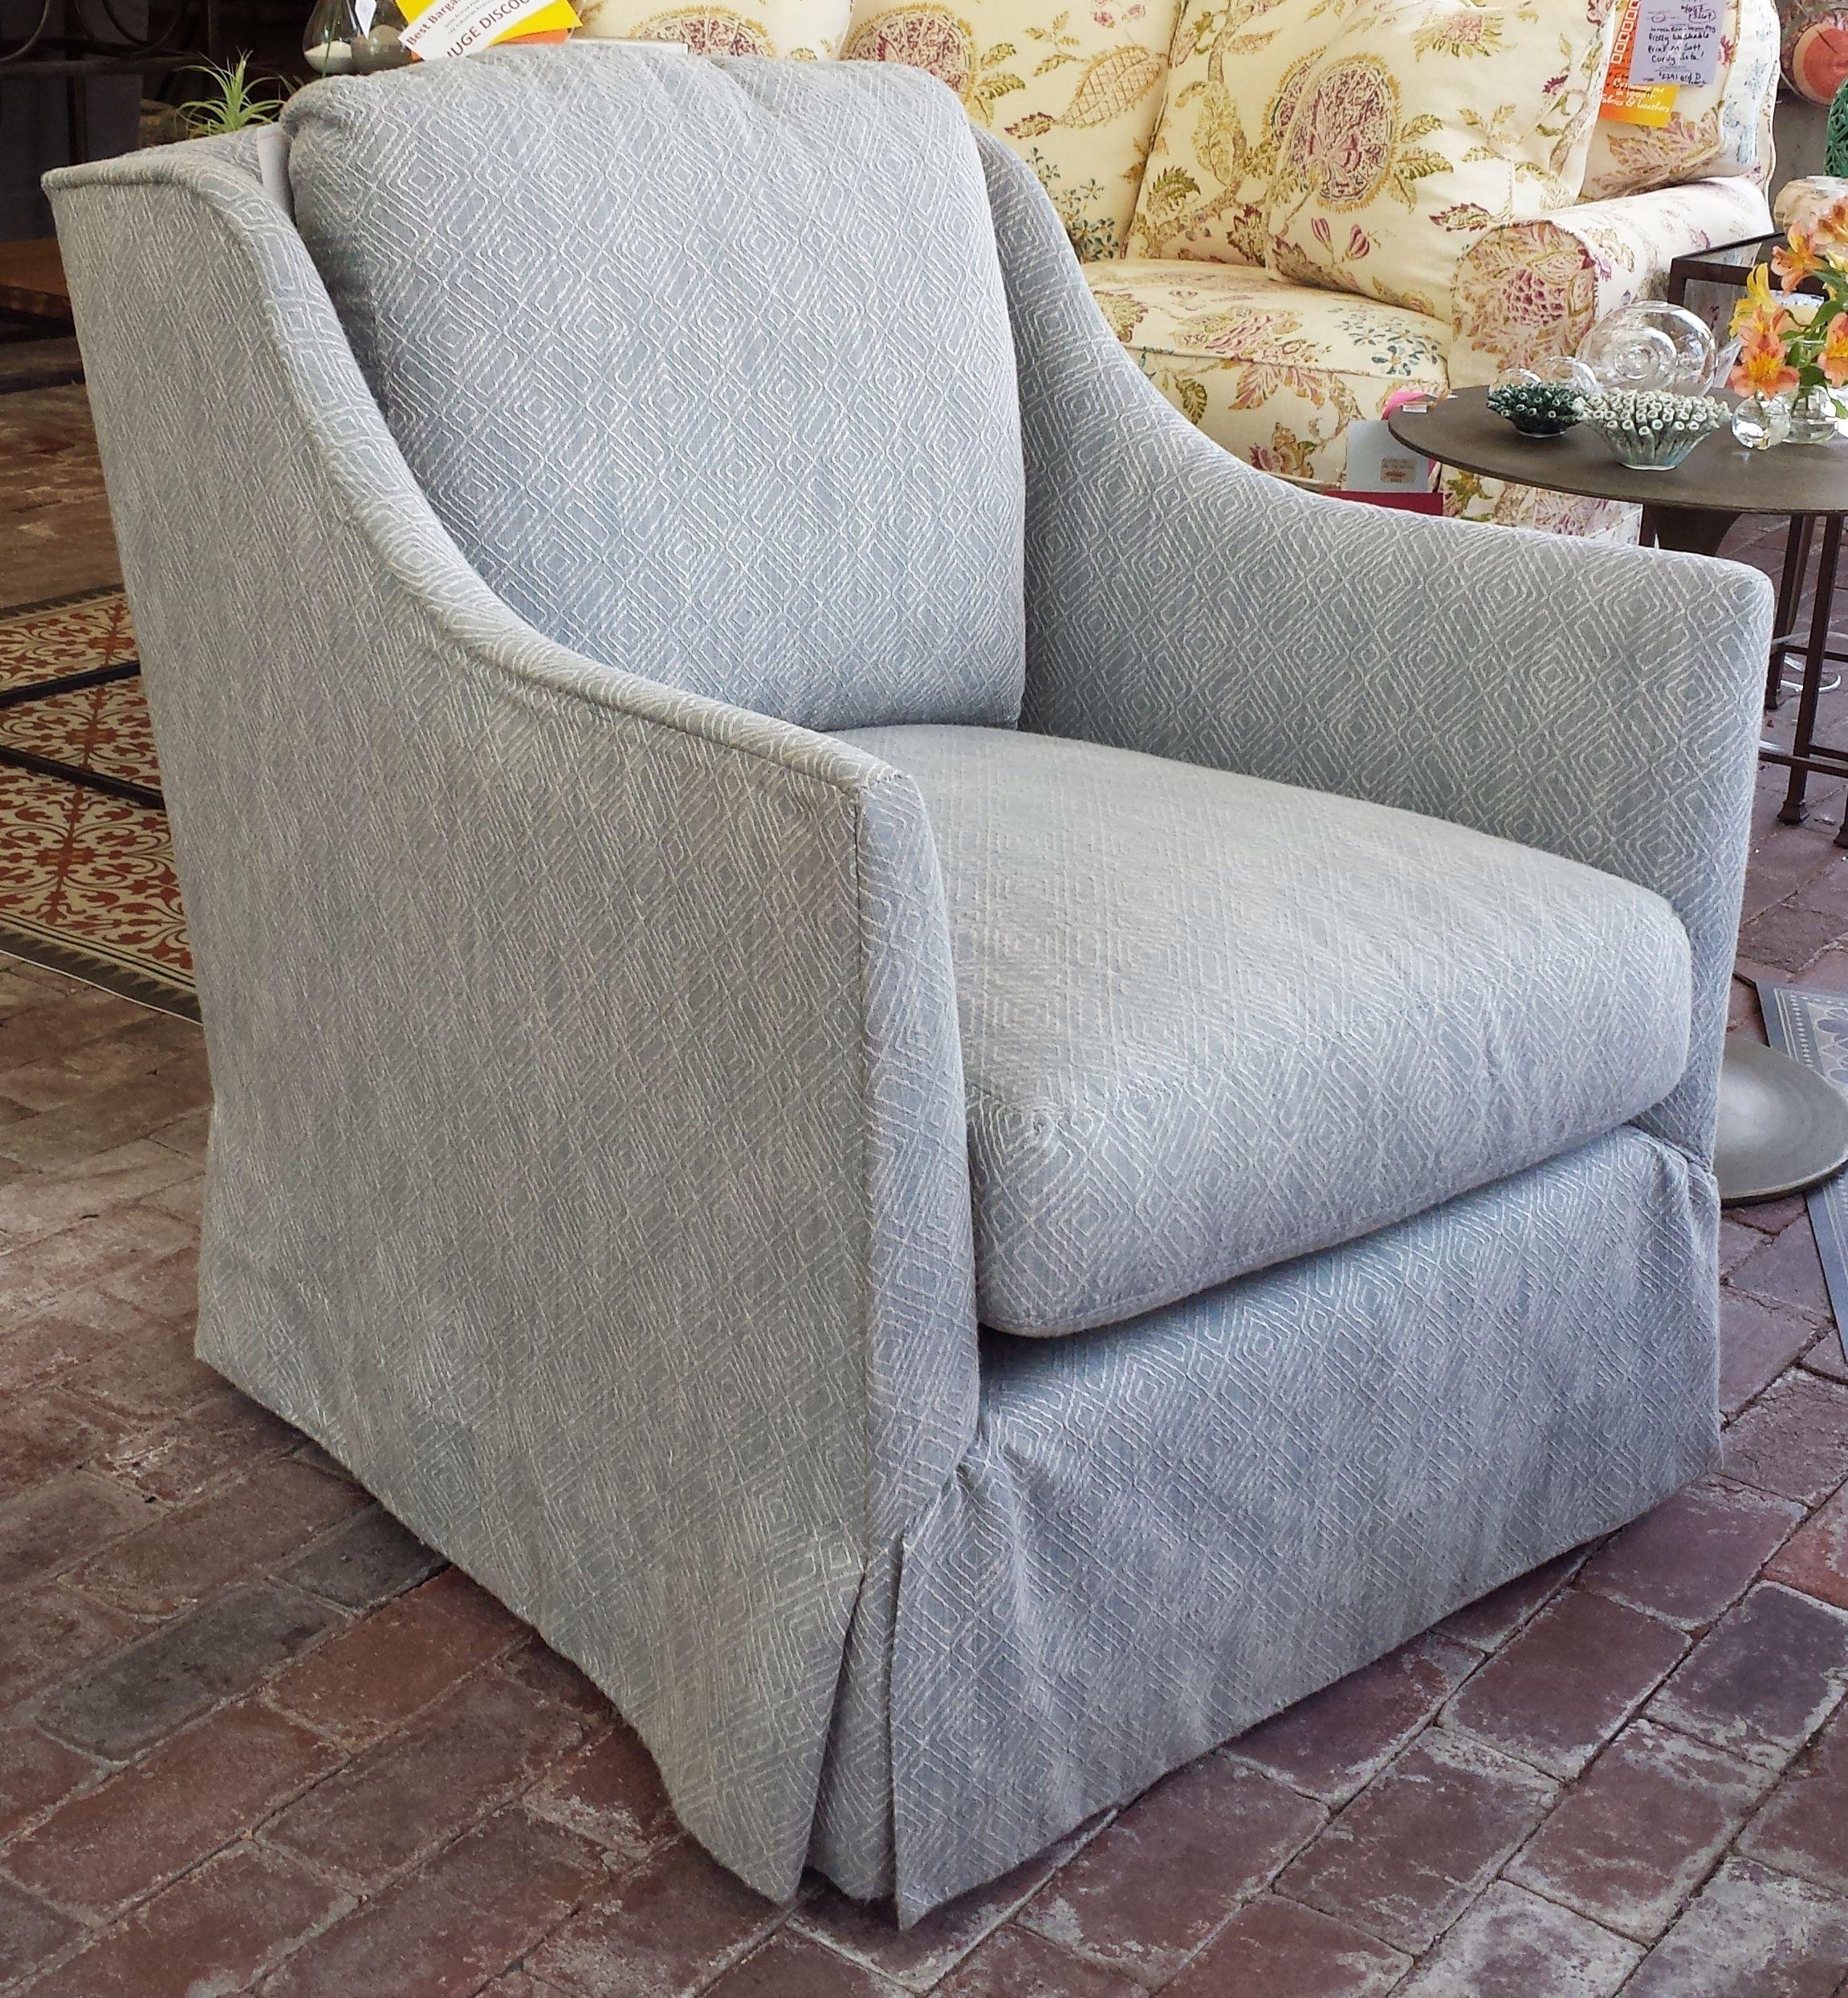 Metric Ocean Swivel Chair Lee Industries Chair Chair Home